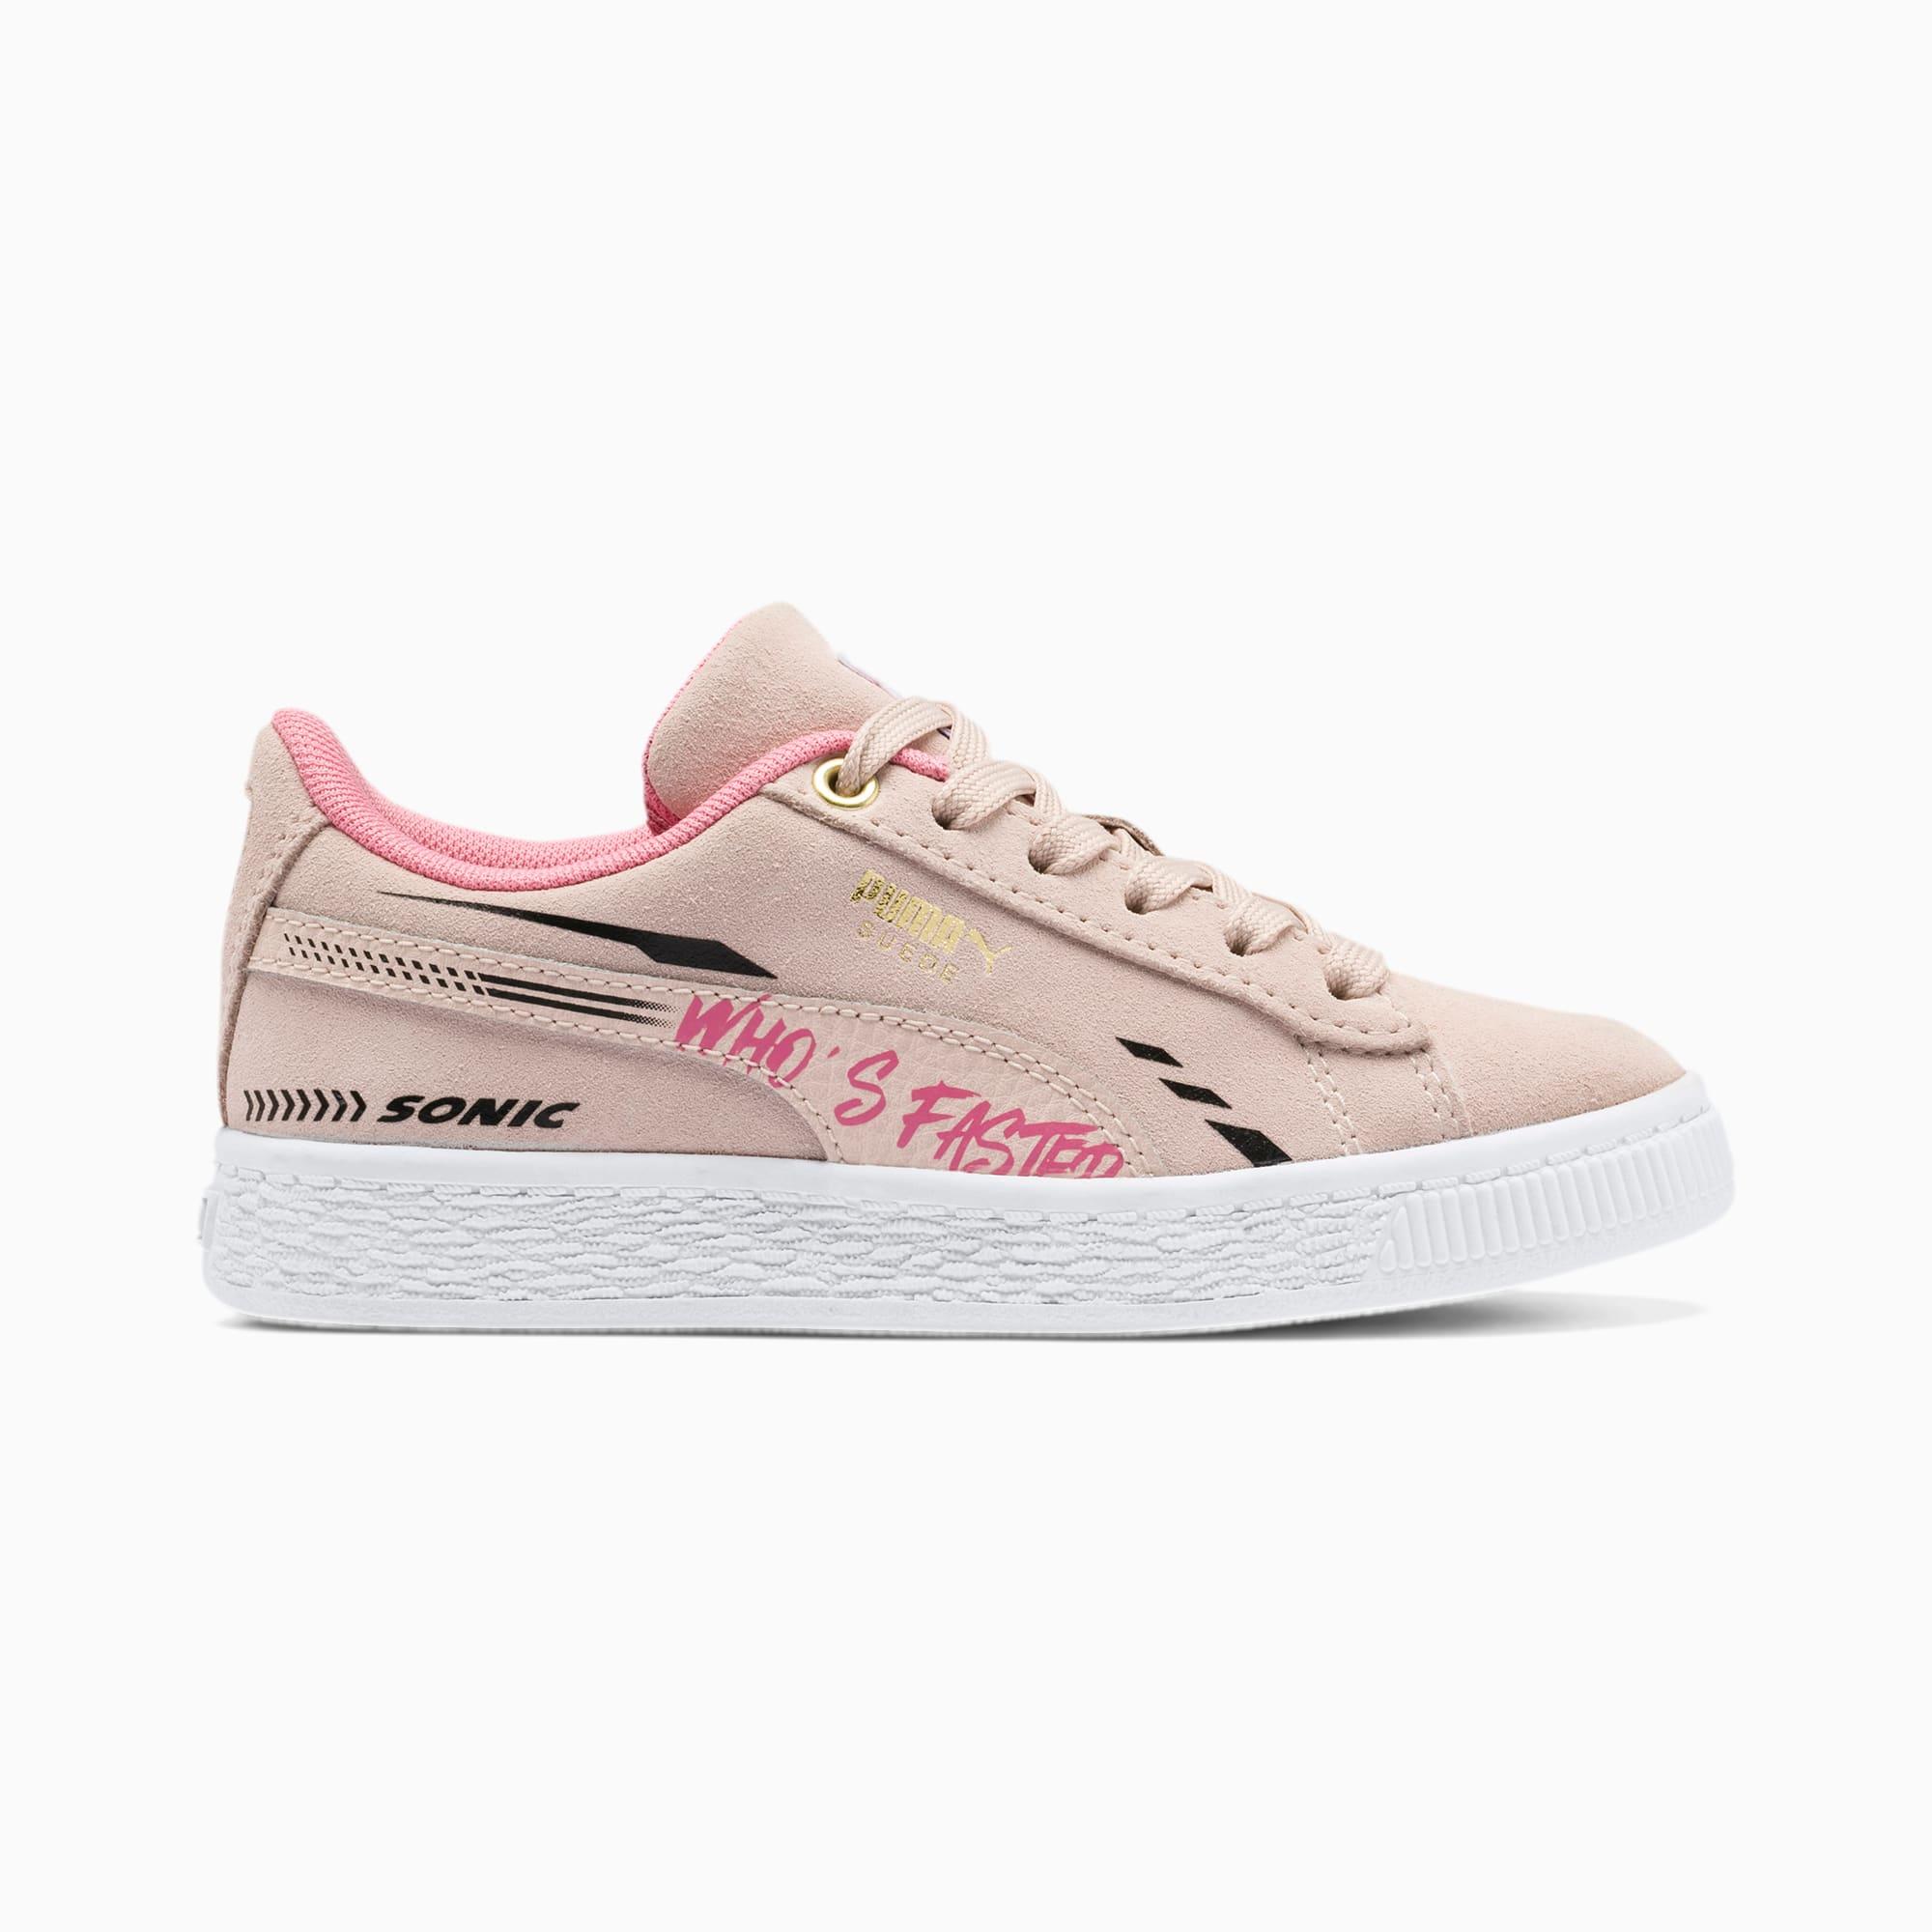 sonic chaussure puma